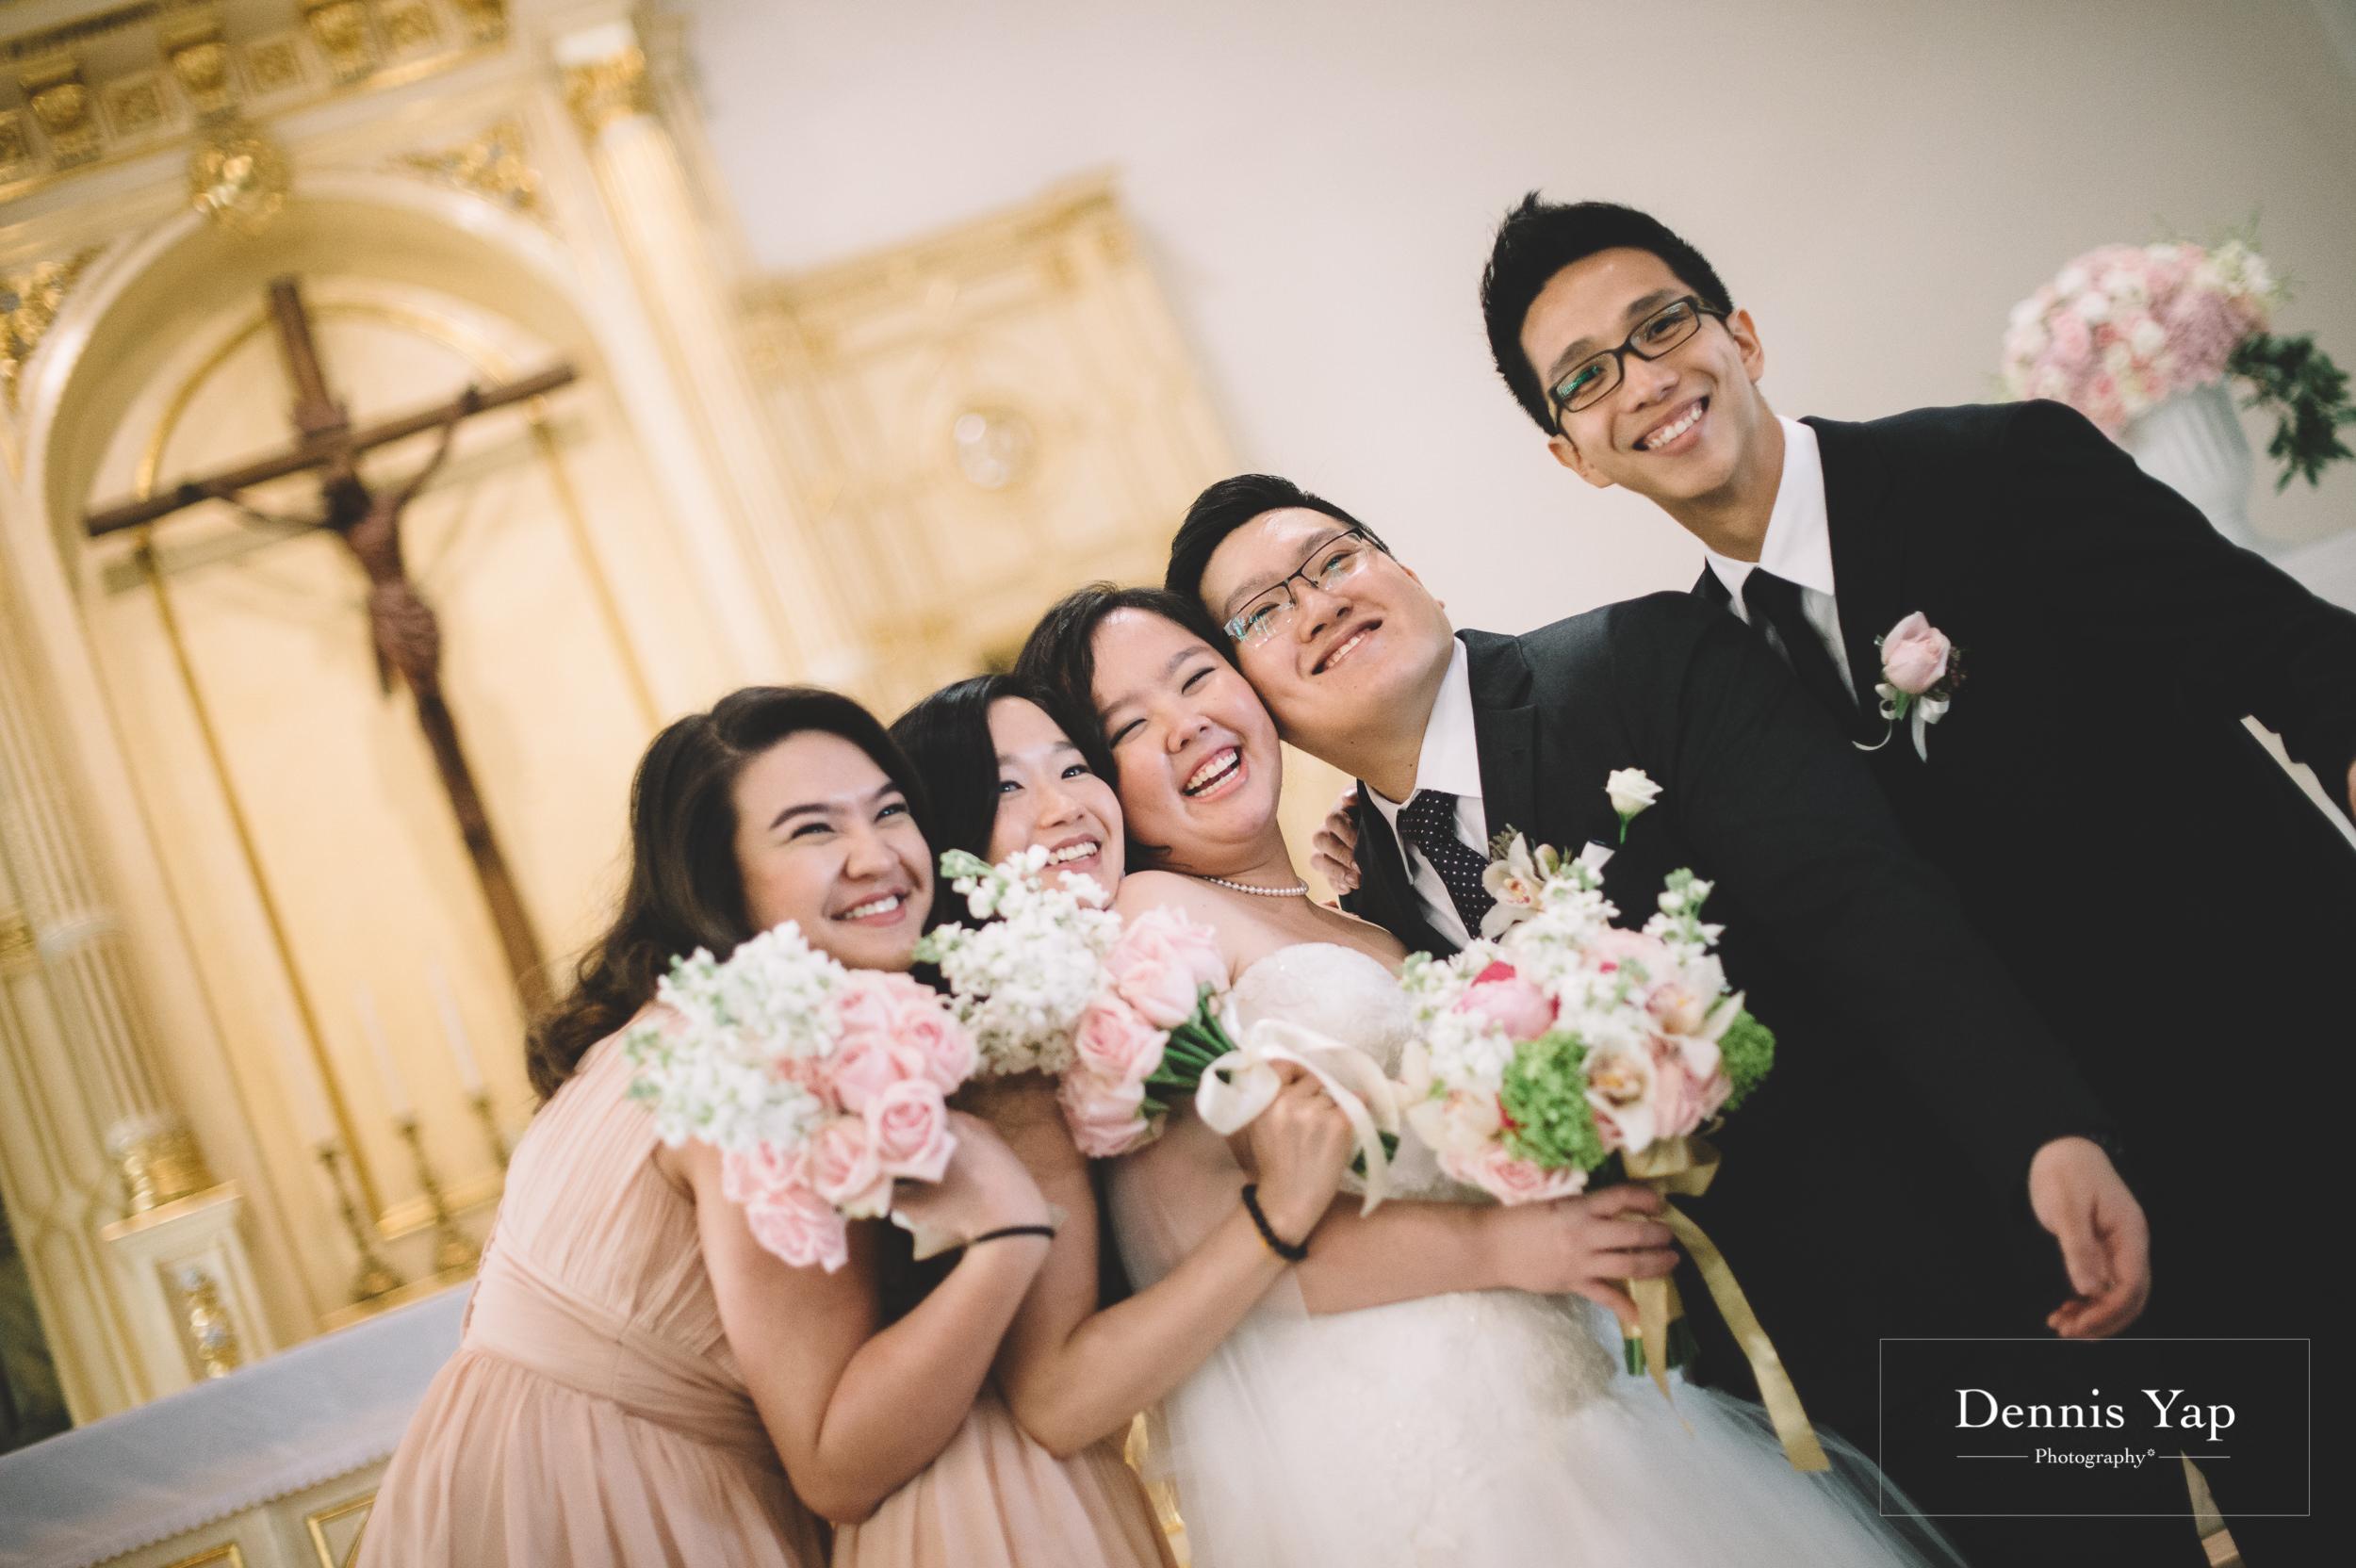 jinhan jacqui church wedding xavier catholic dennis yap photography malaysia wedding photographer-26.jpg